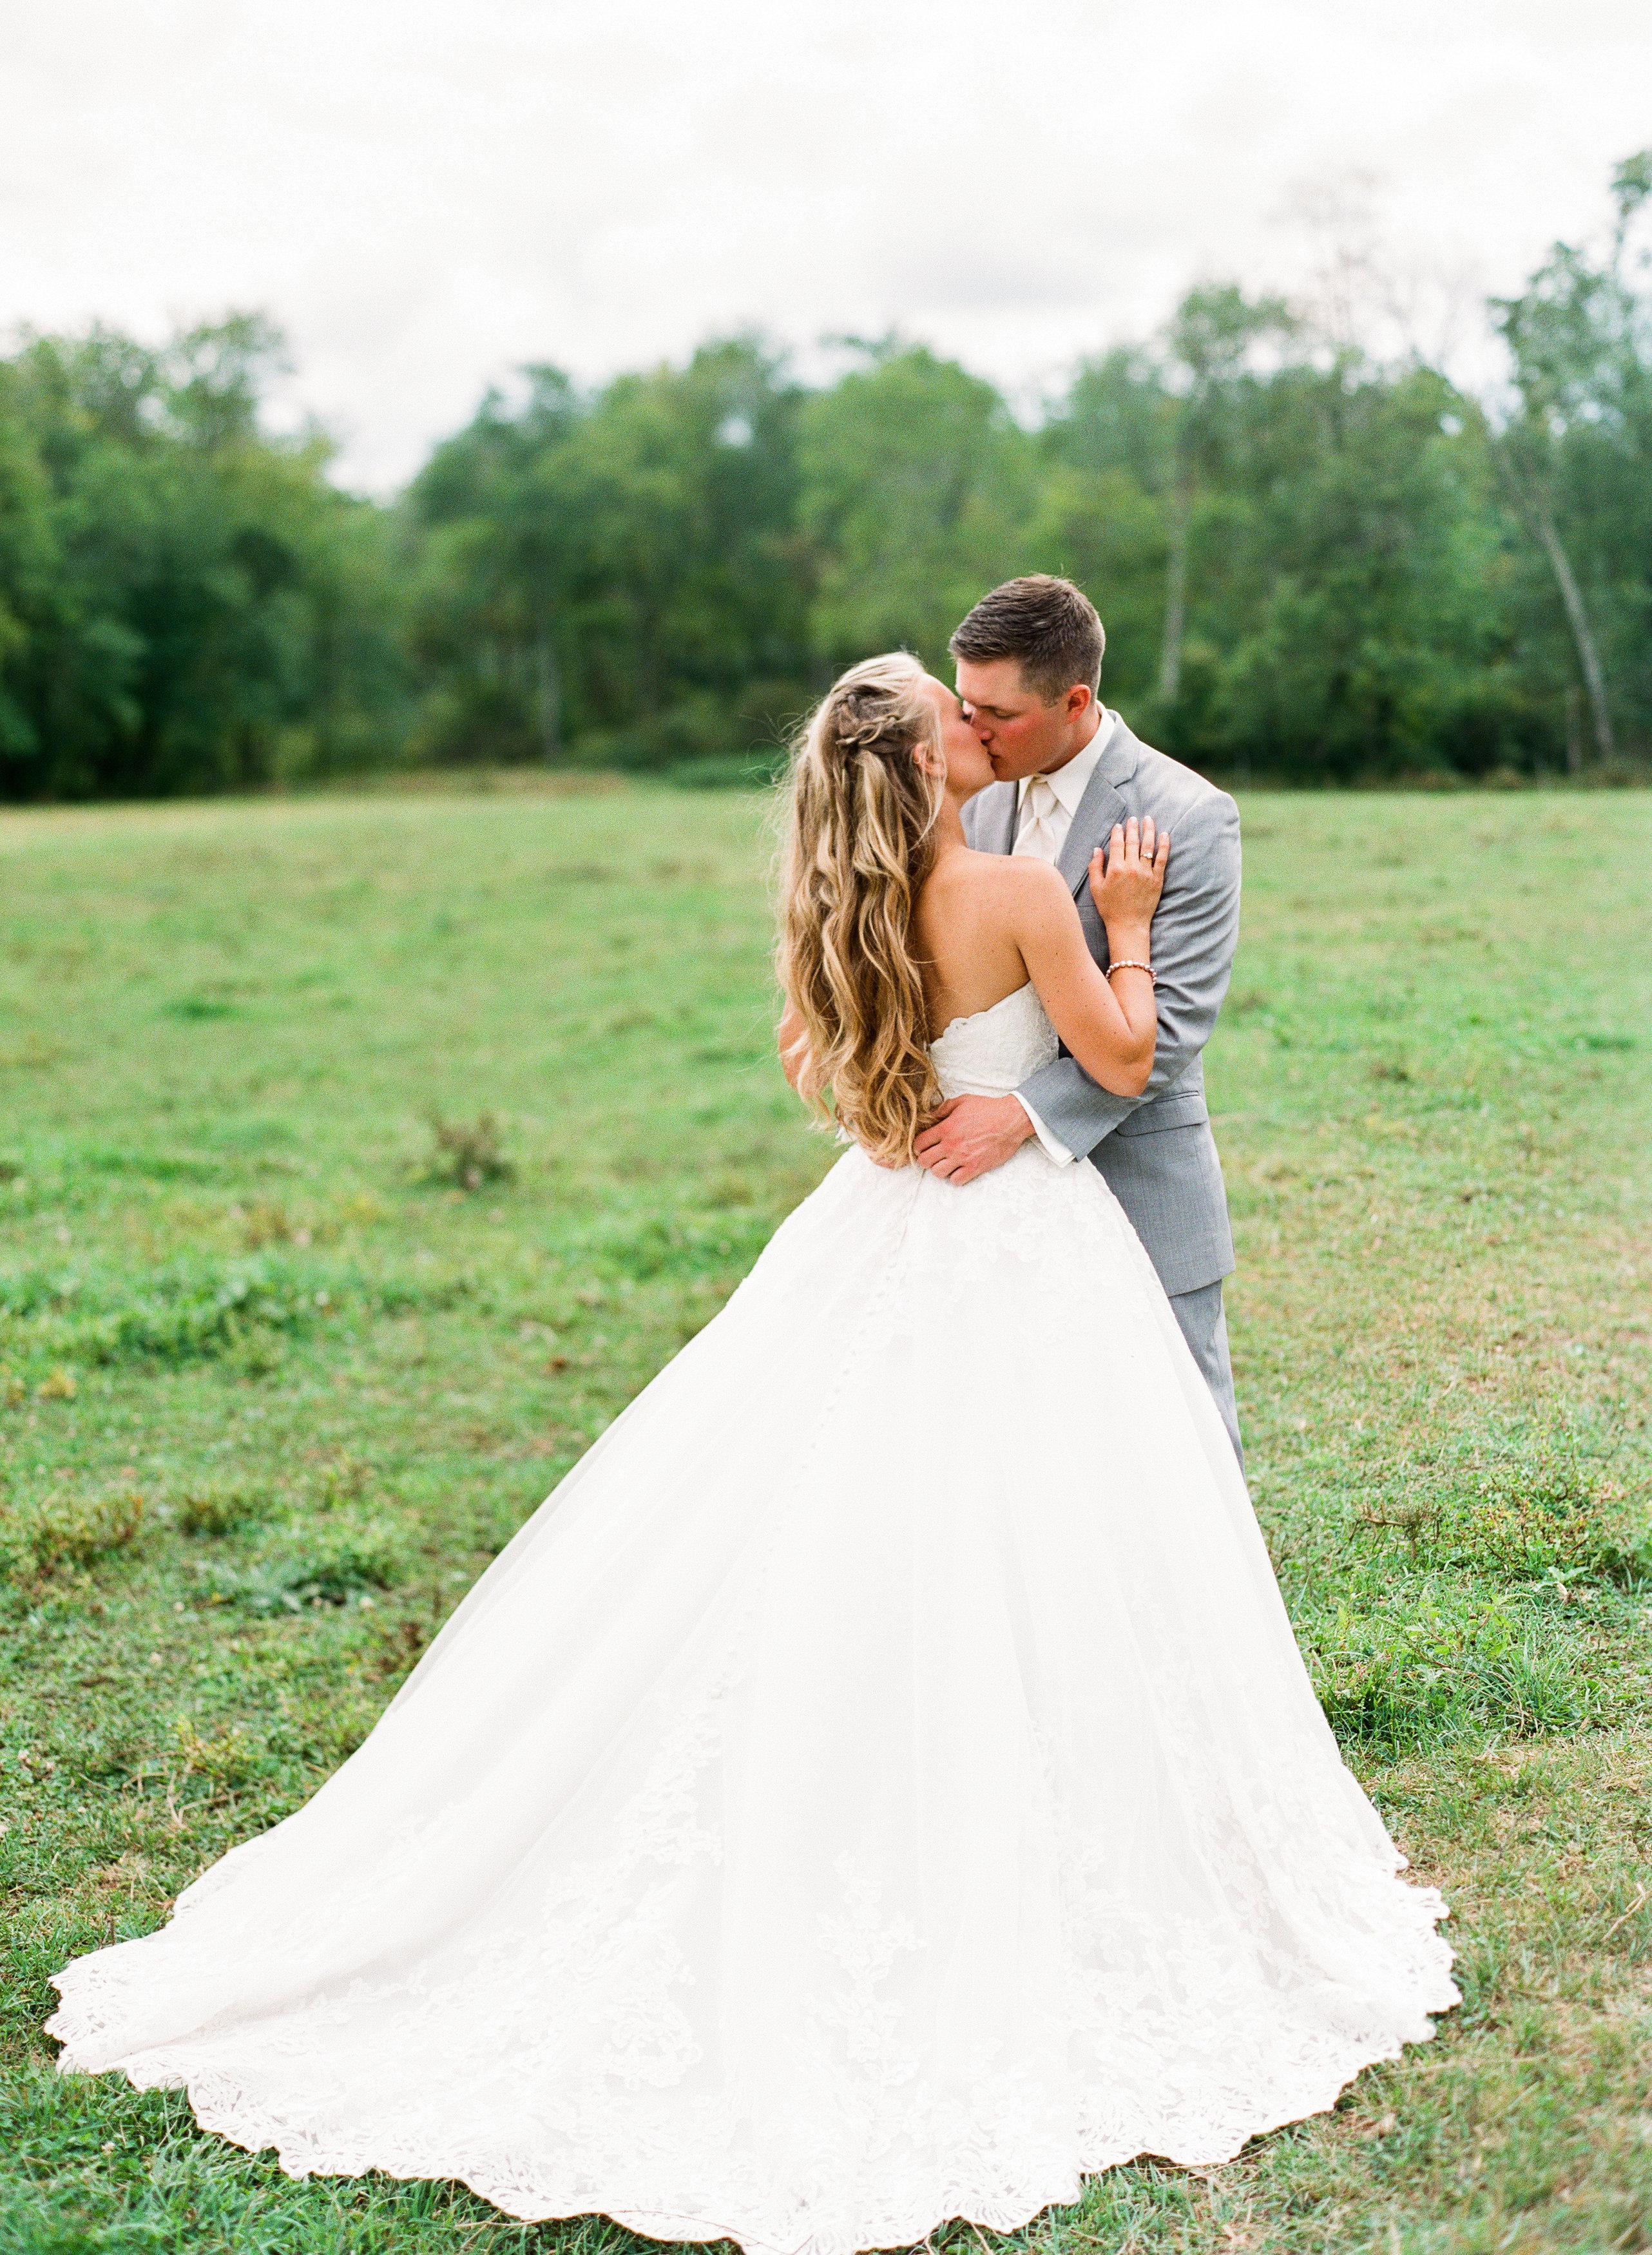 Stephanie&Dan-Wedding-LindsayMaddenPhotographyII-82